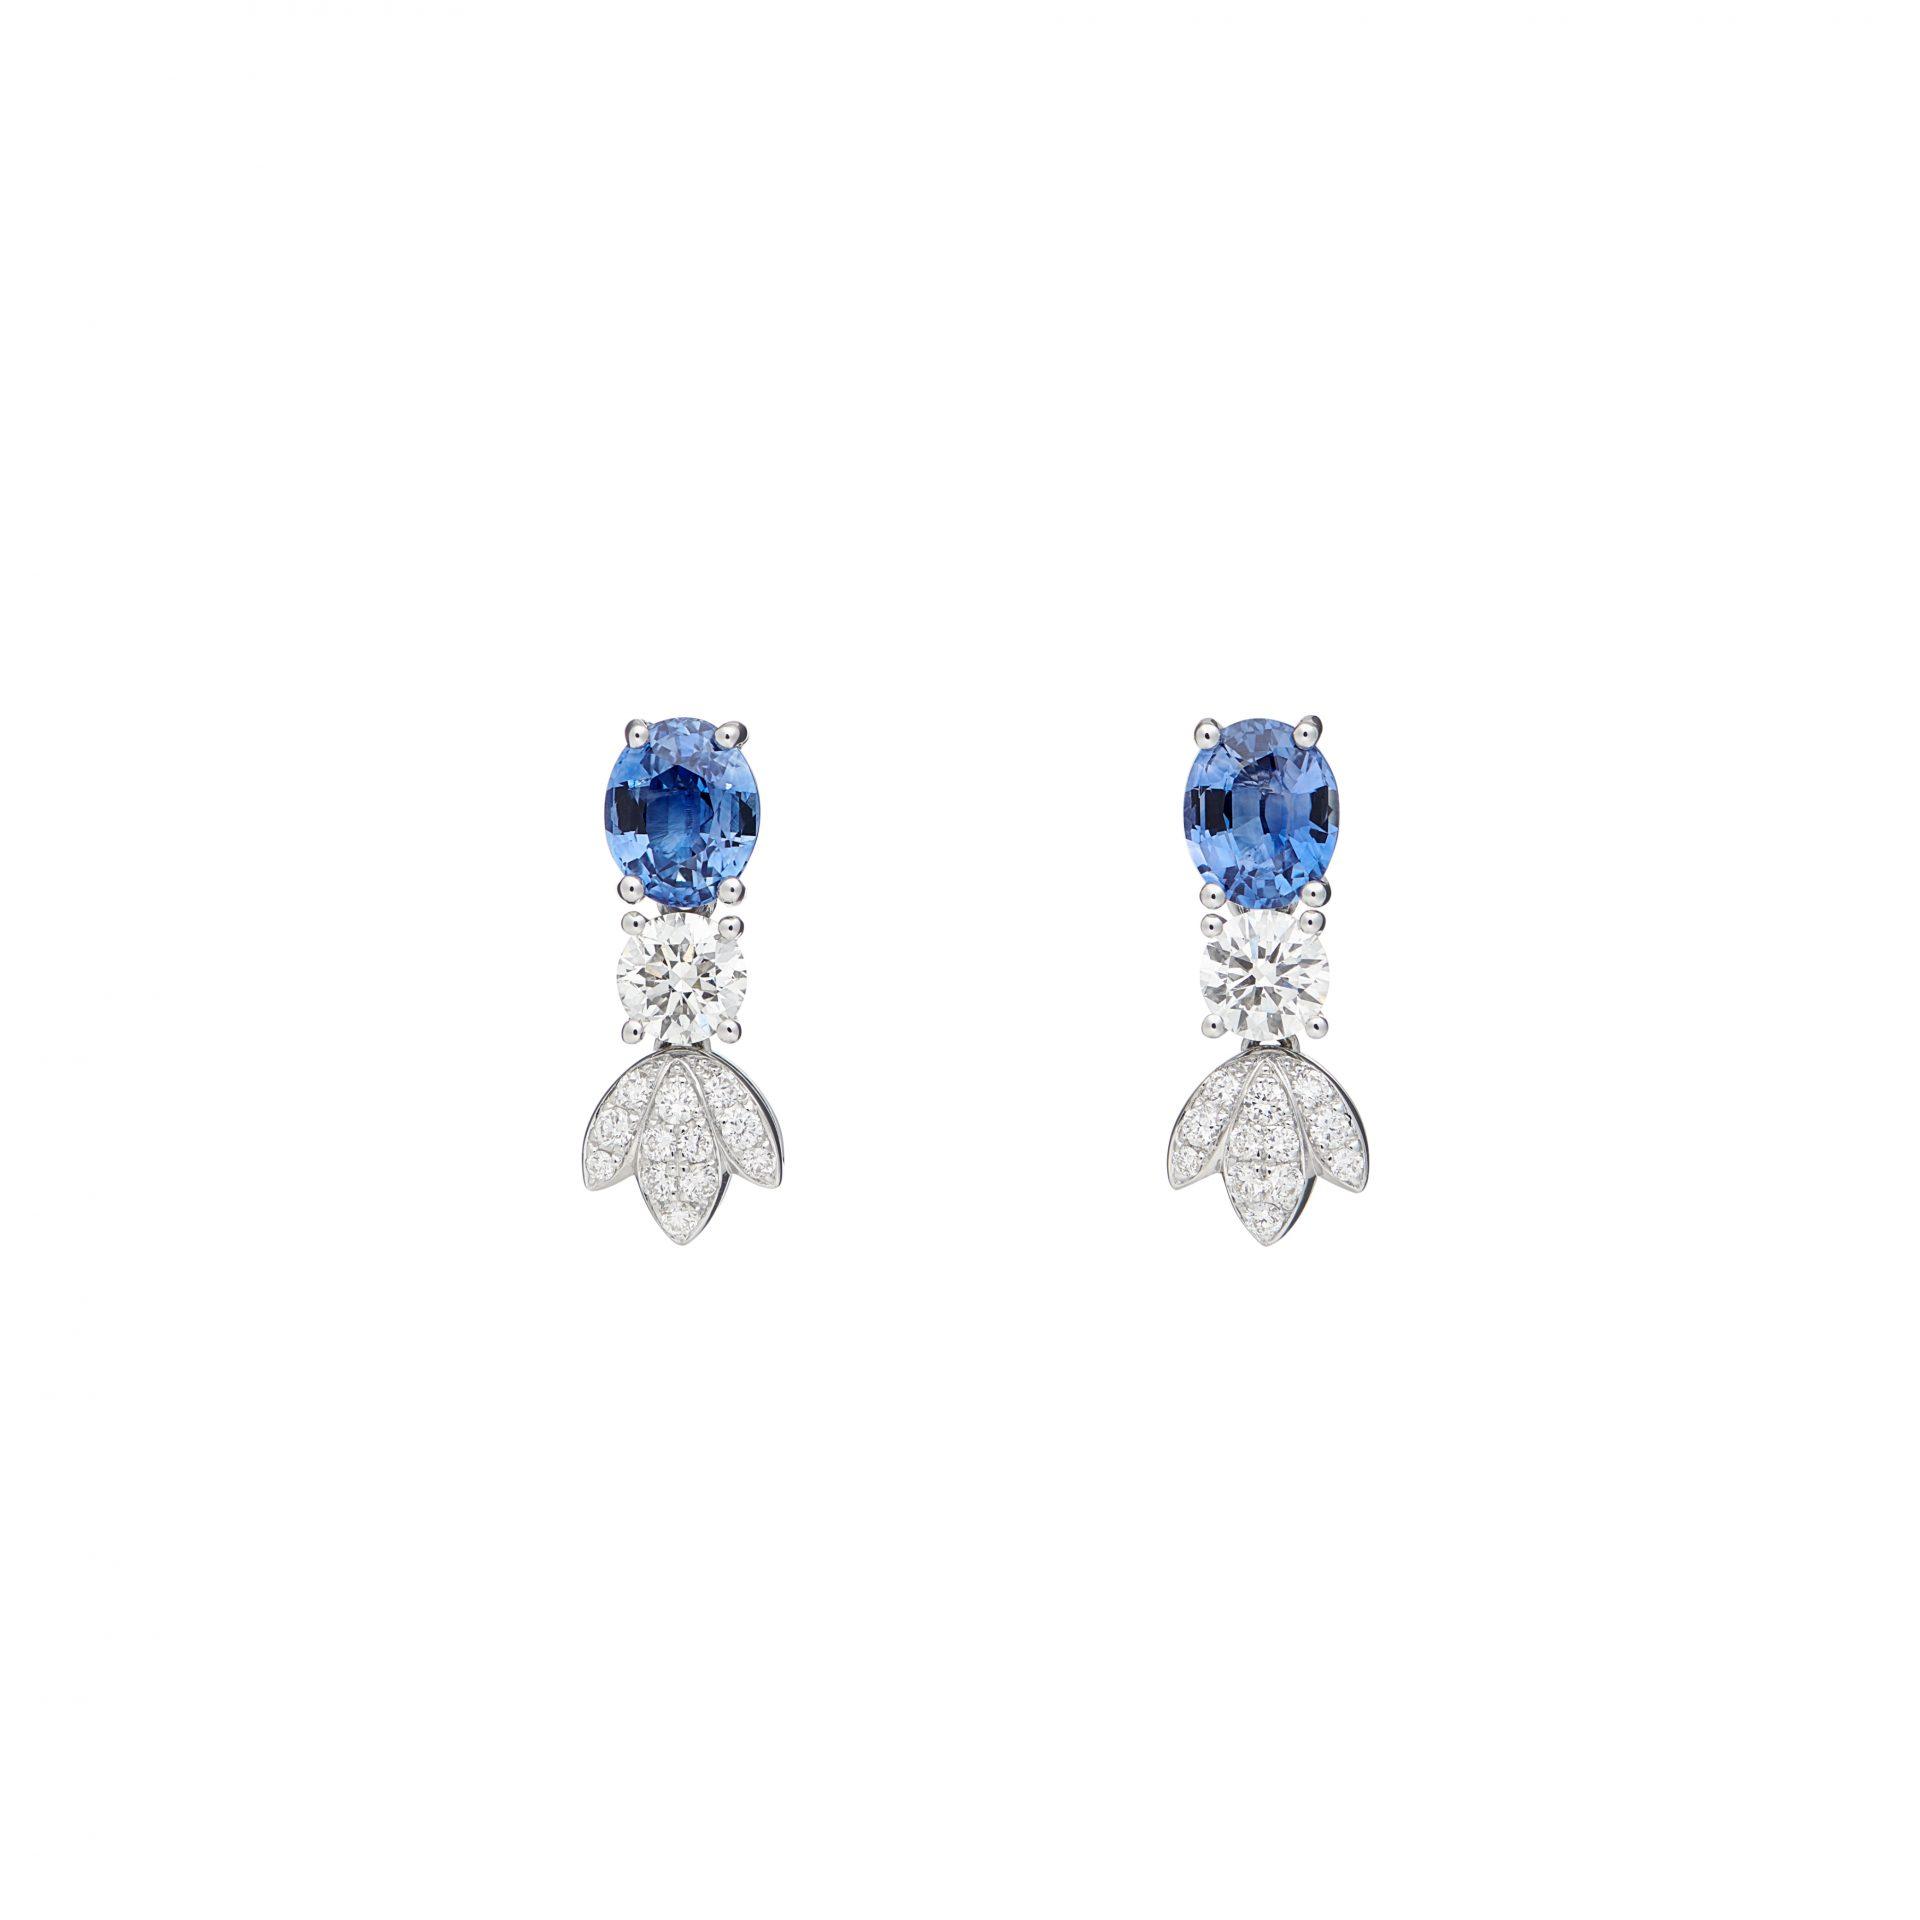 Lily Bleue Earrings